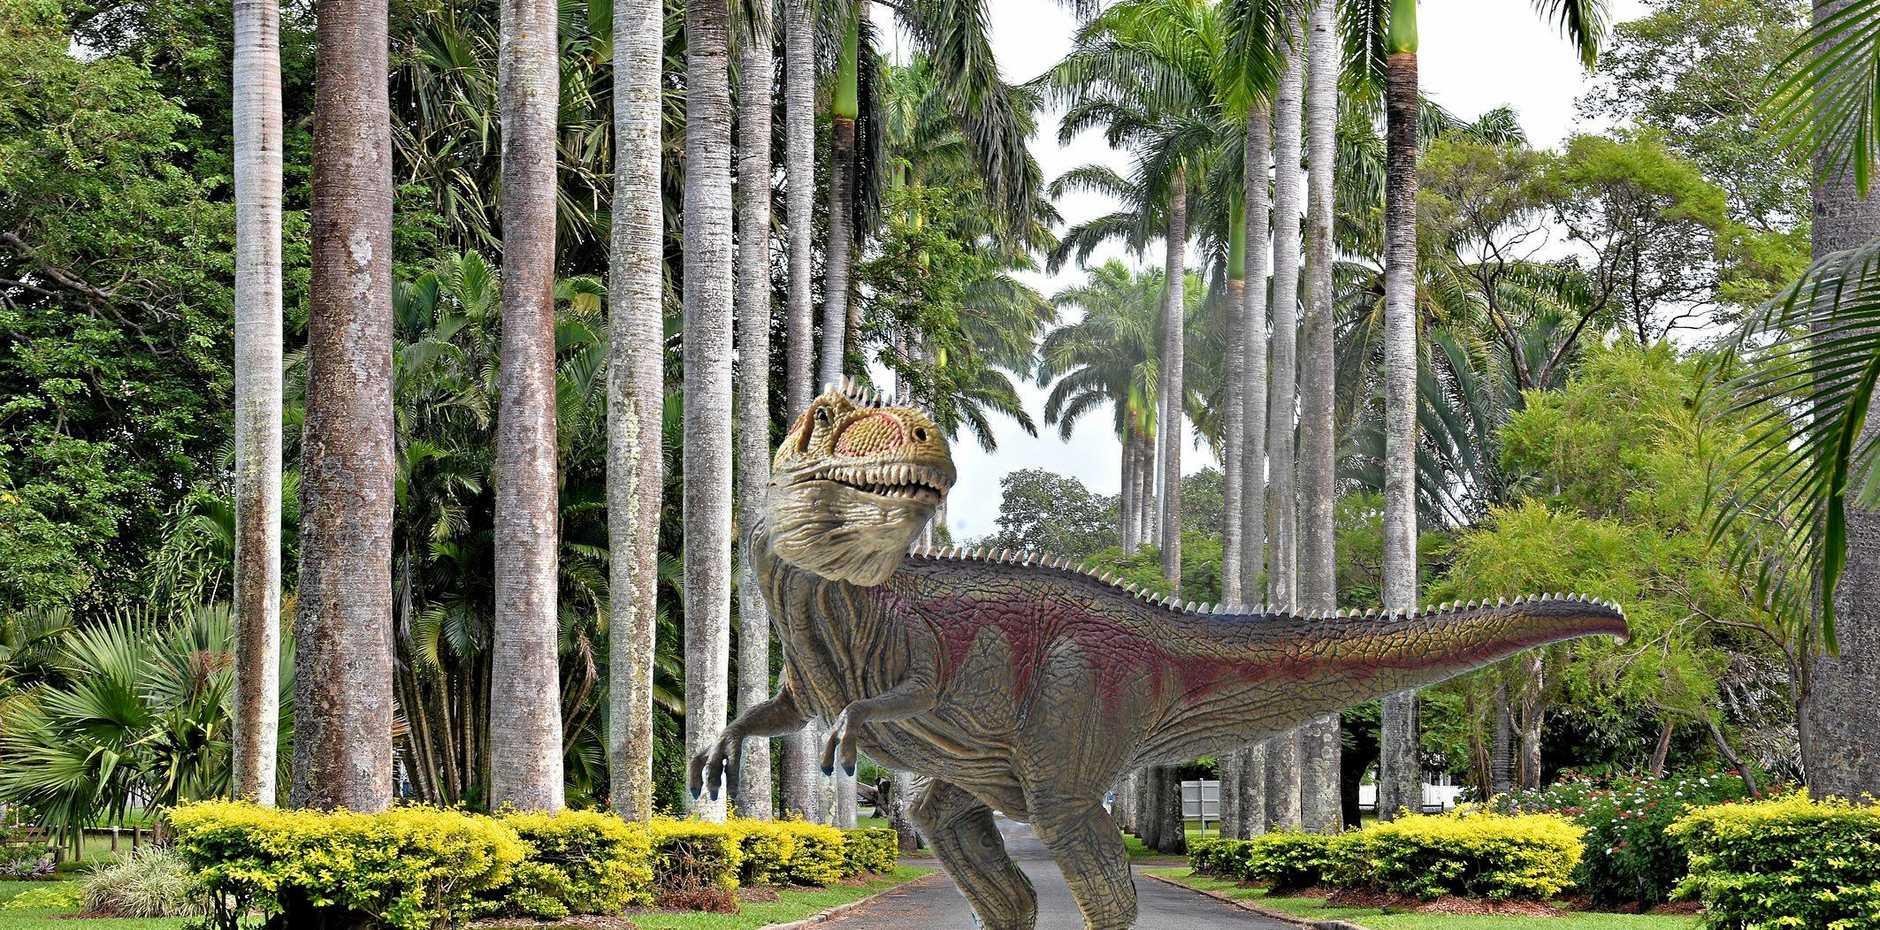 PREHISTORIC THRILLER: A dinosaur